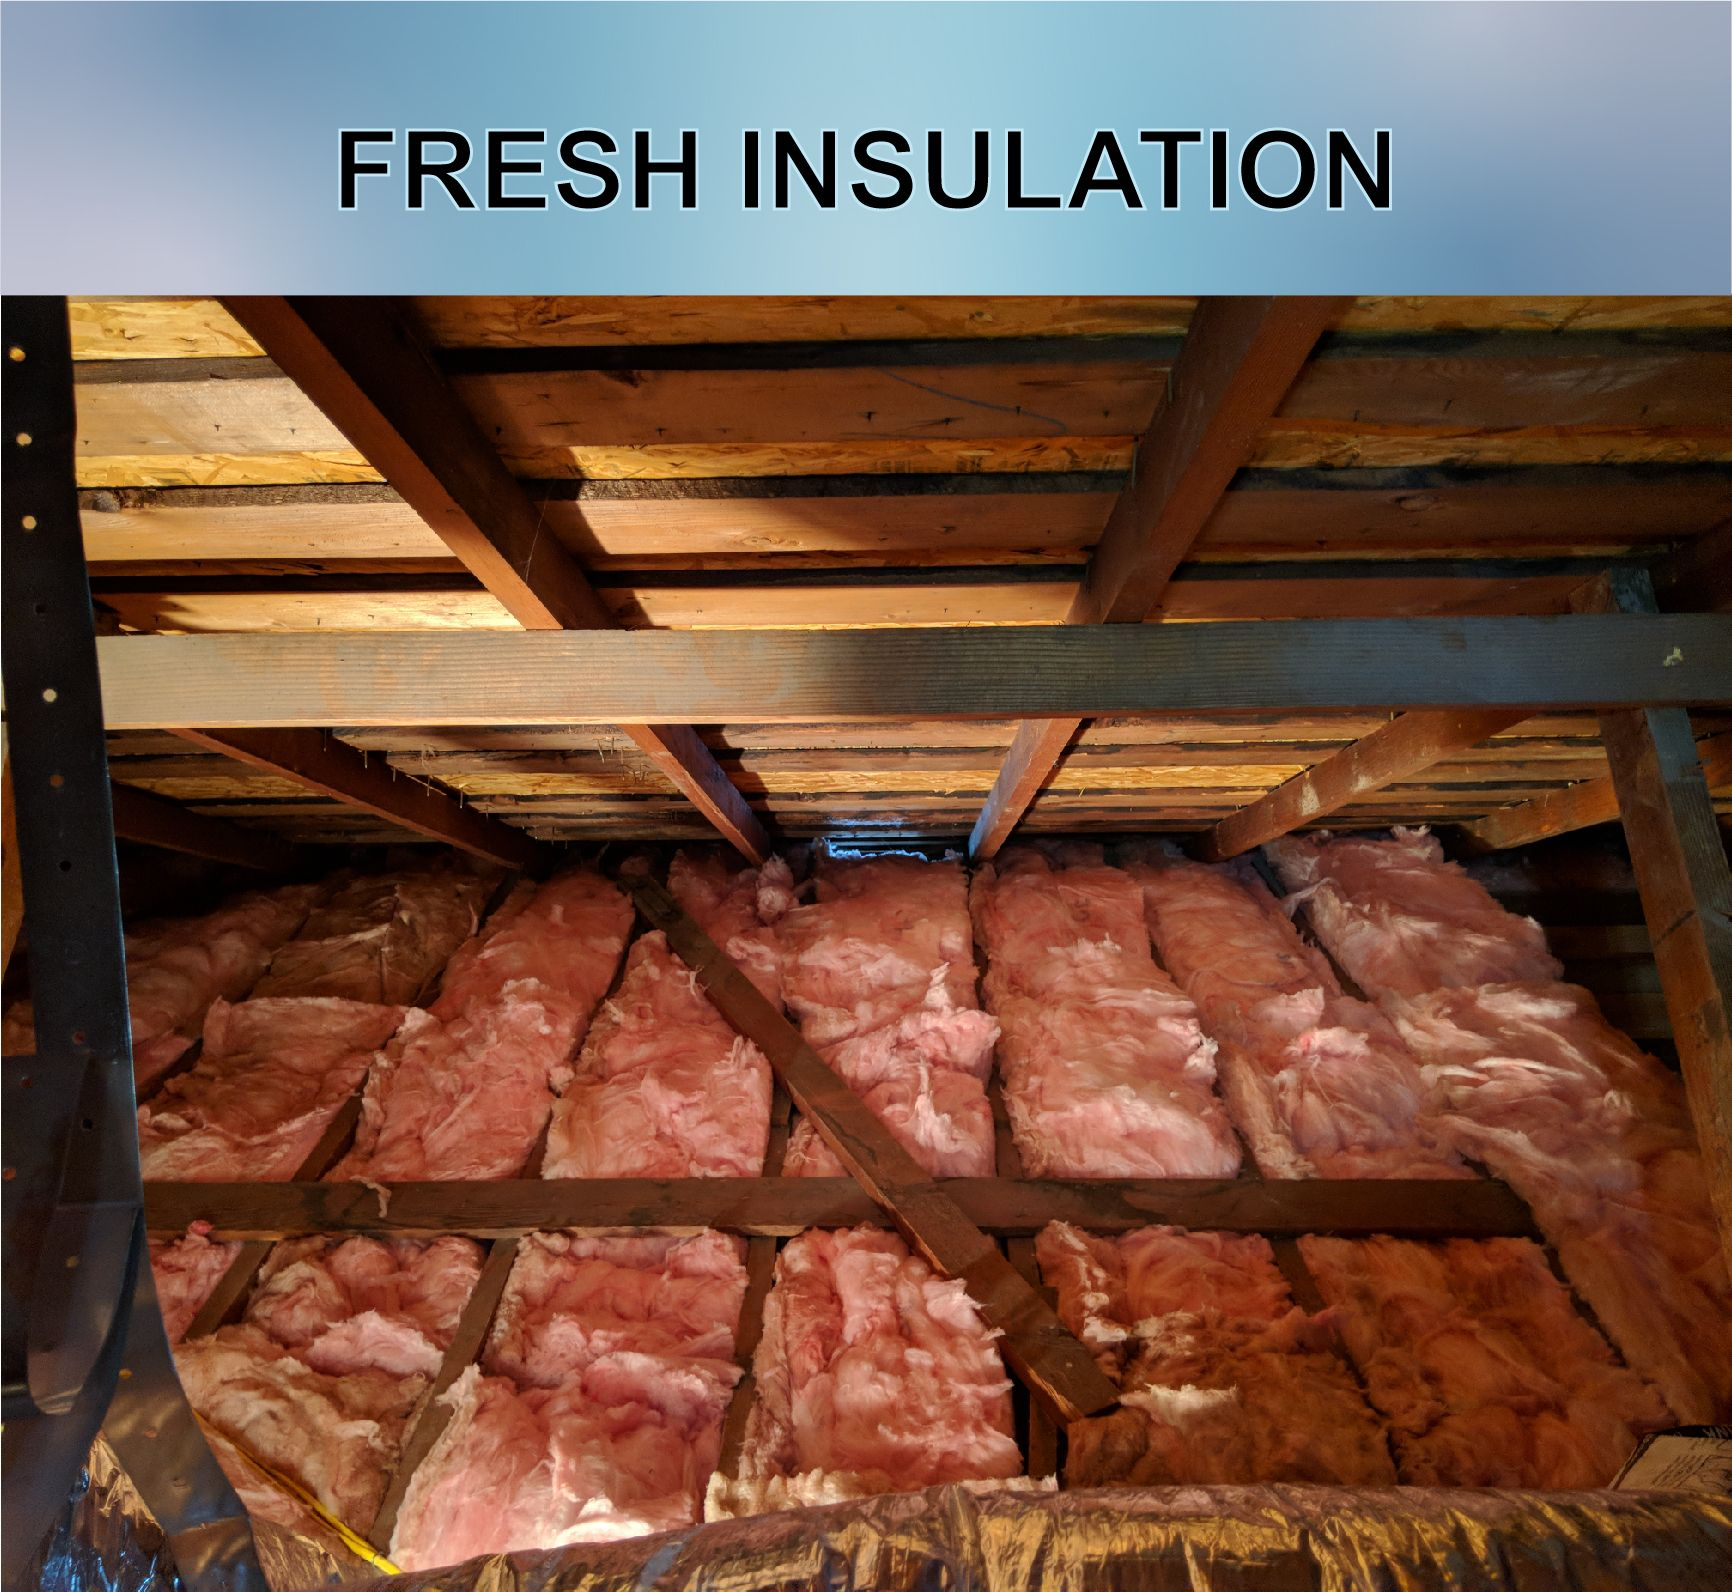 Attic Insulation Types Of Insulation Insulation Loose Fill Insulation